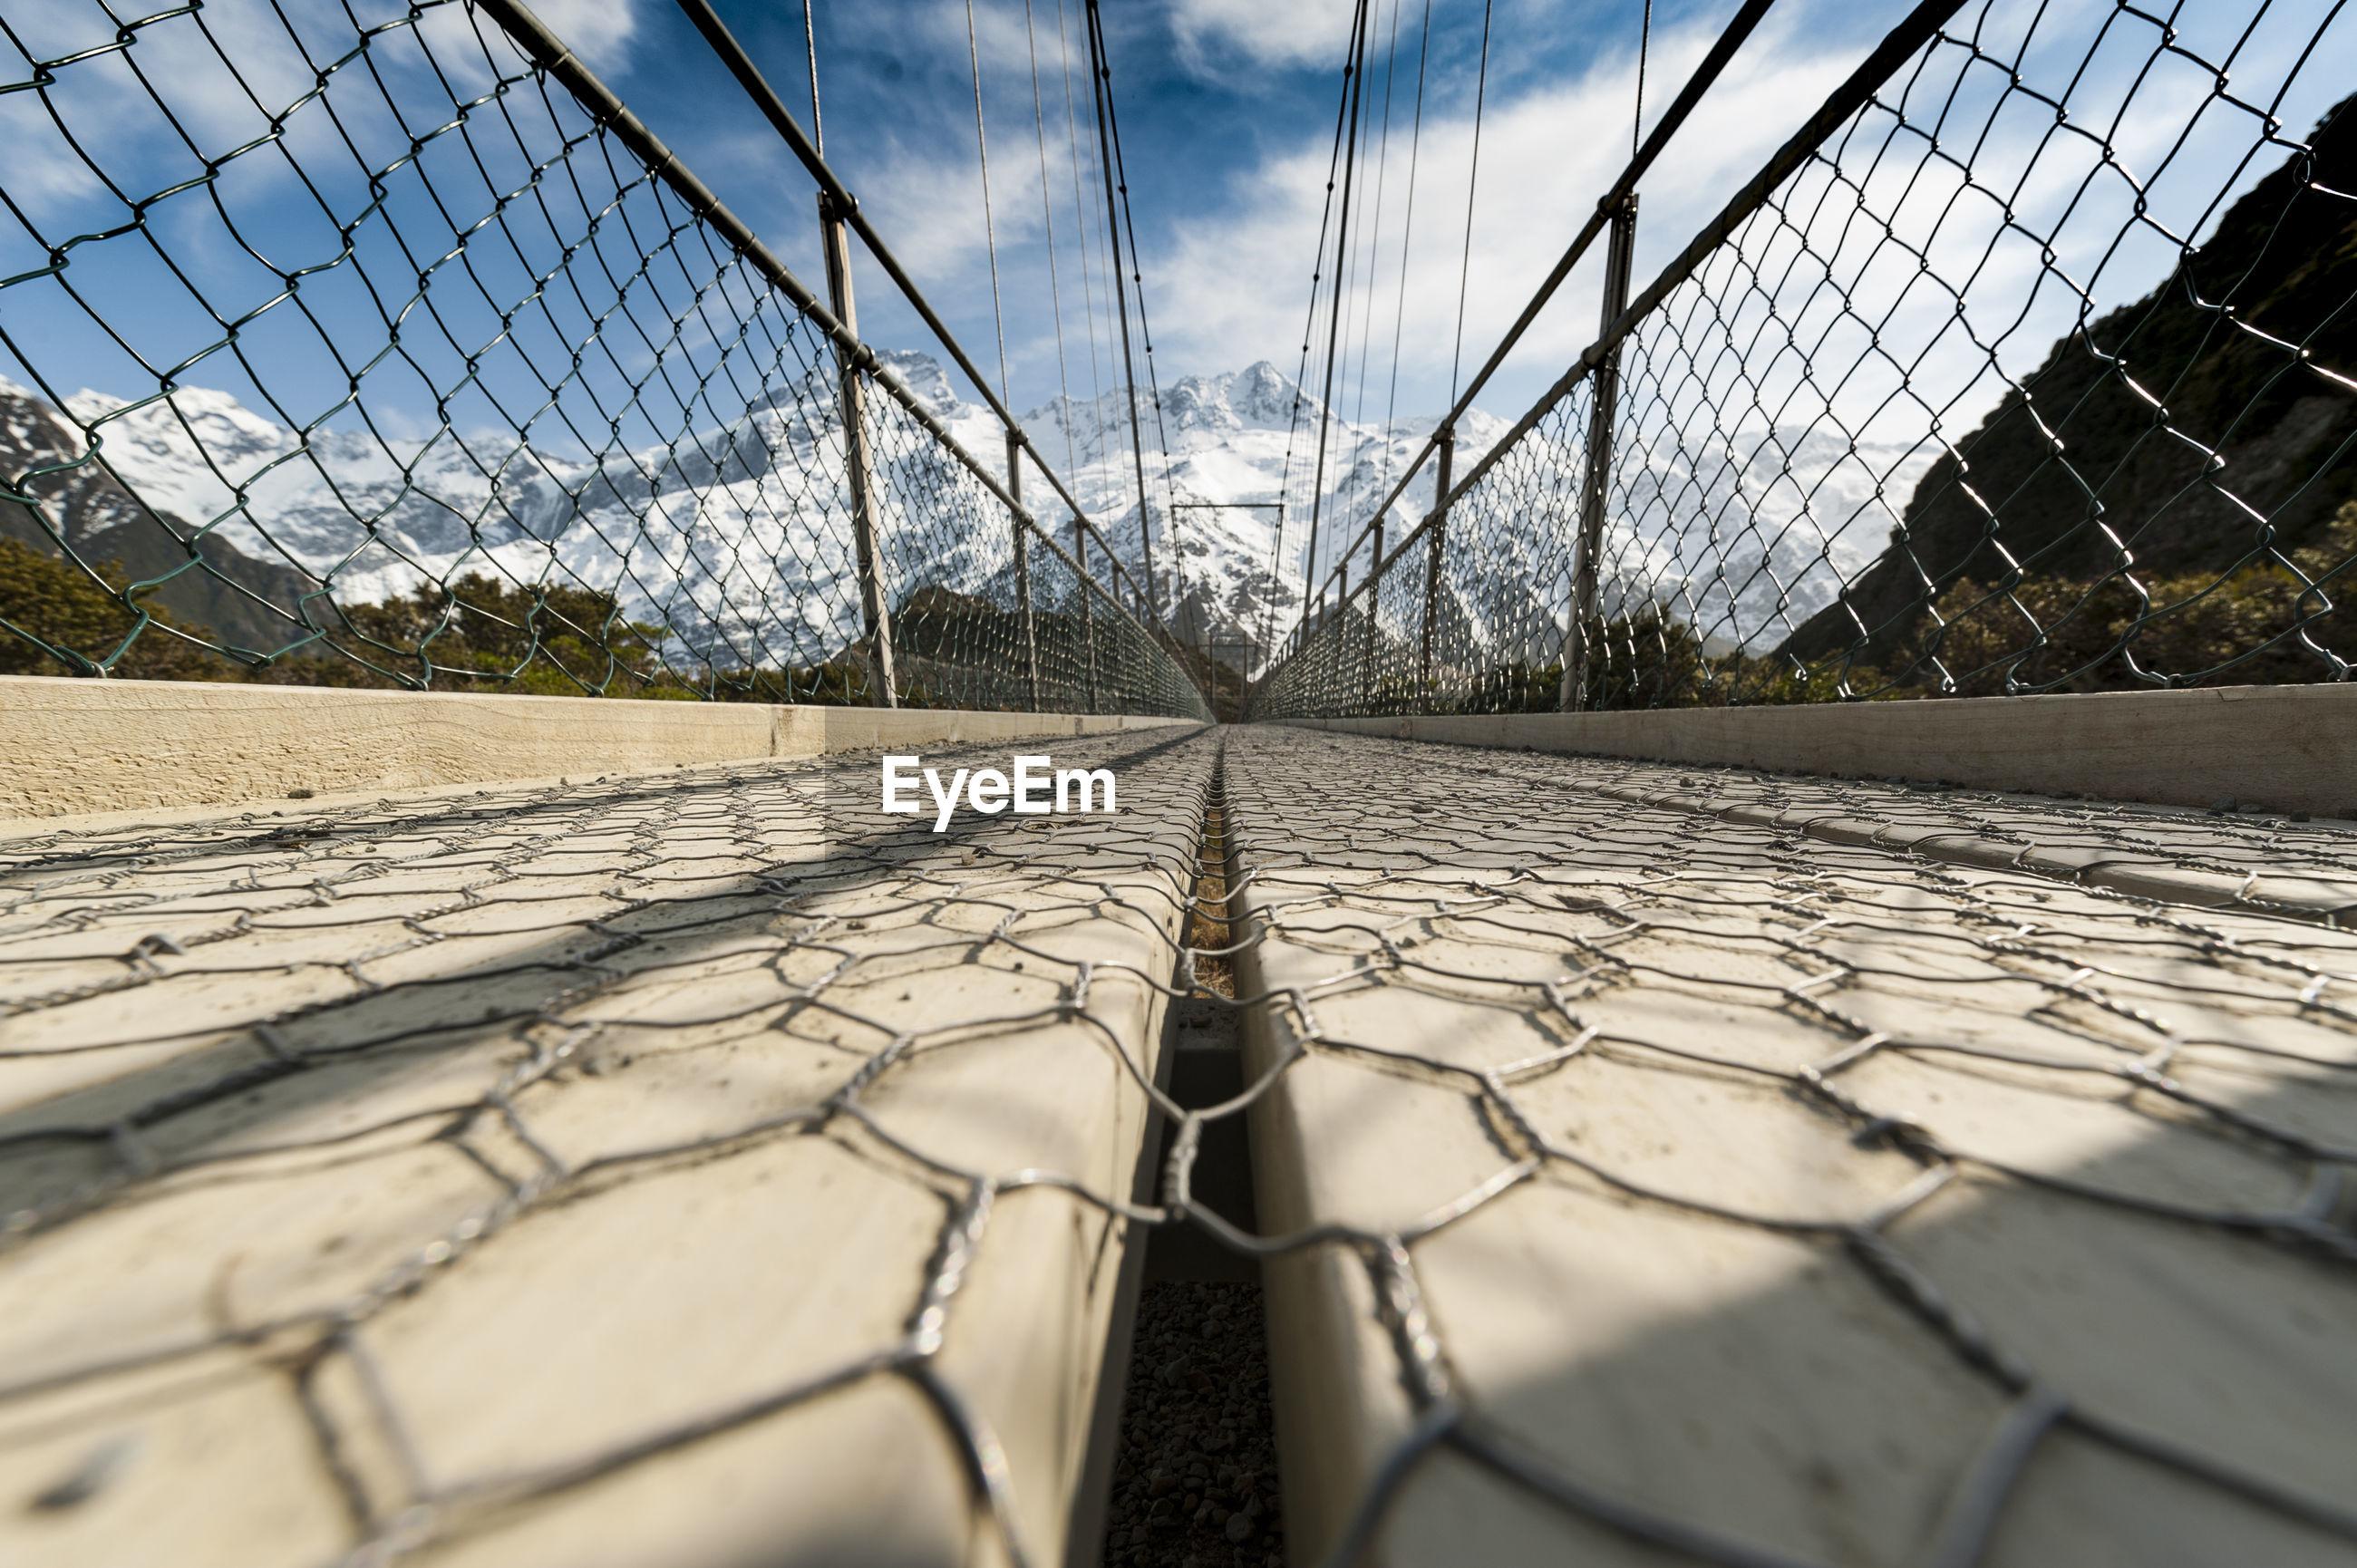 Surface level of footbridge